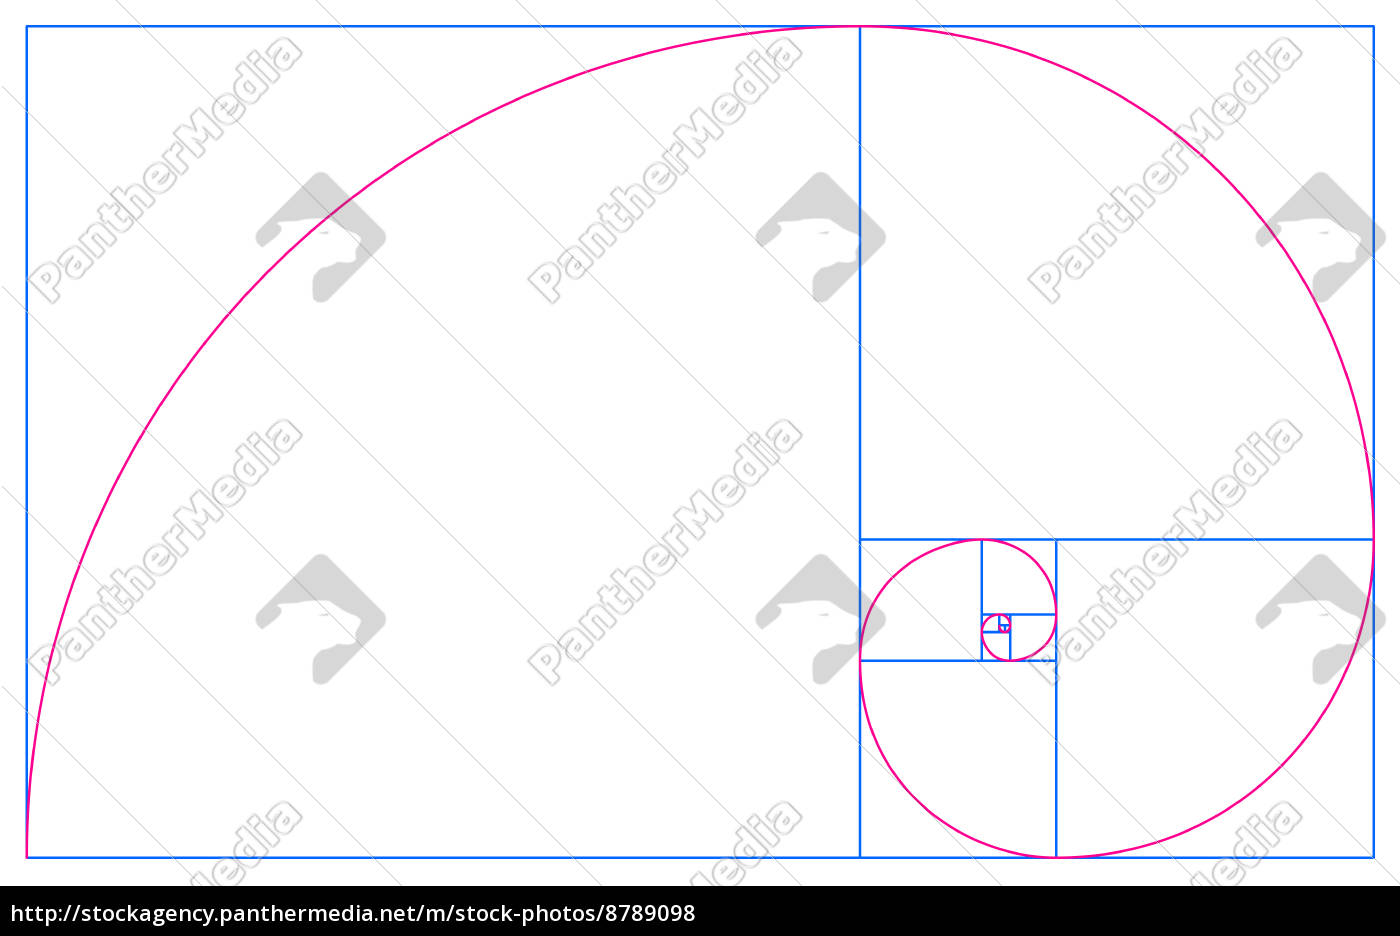 Goldenen Schnitt fibonacci spirale im goldenen schnitt blau rot auf stock photo